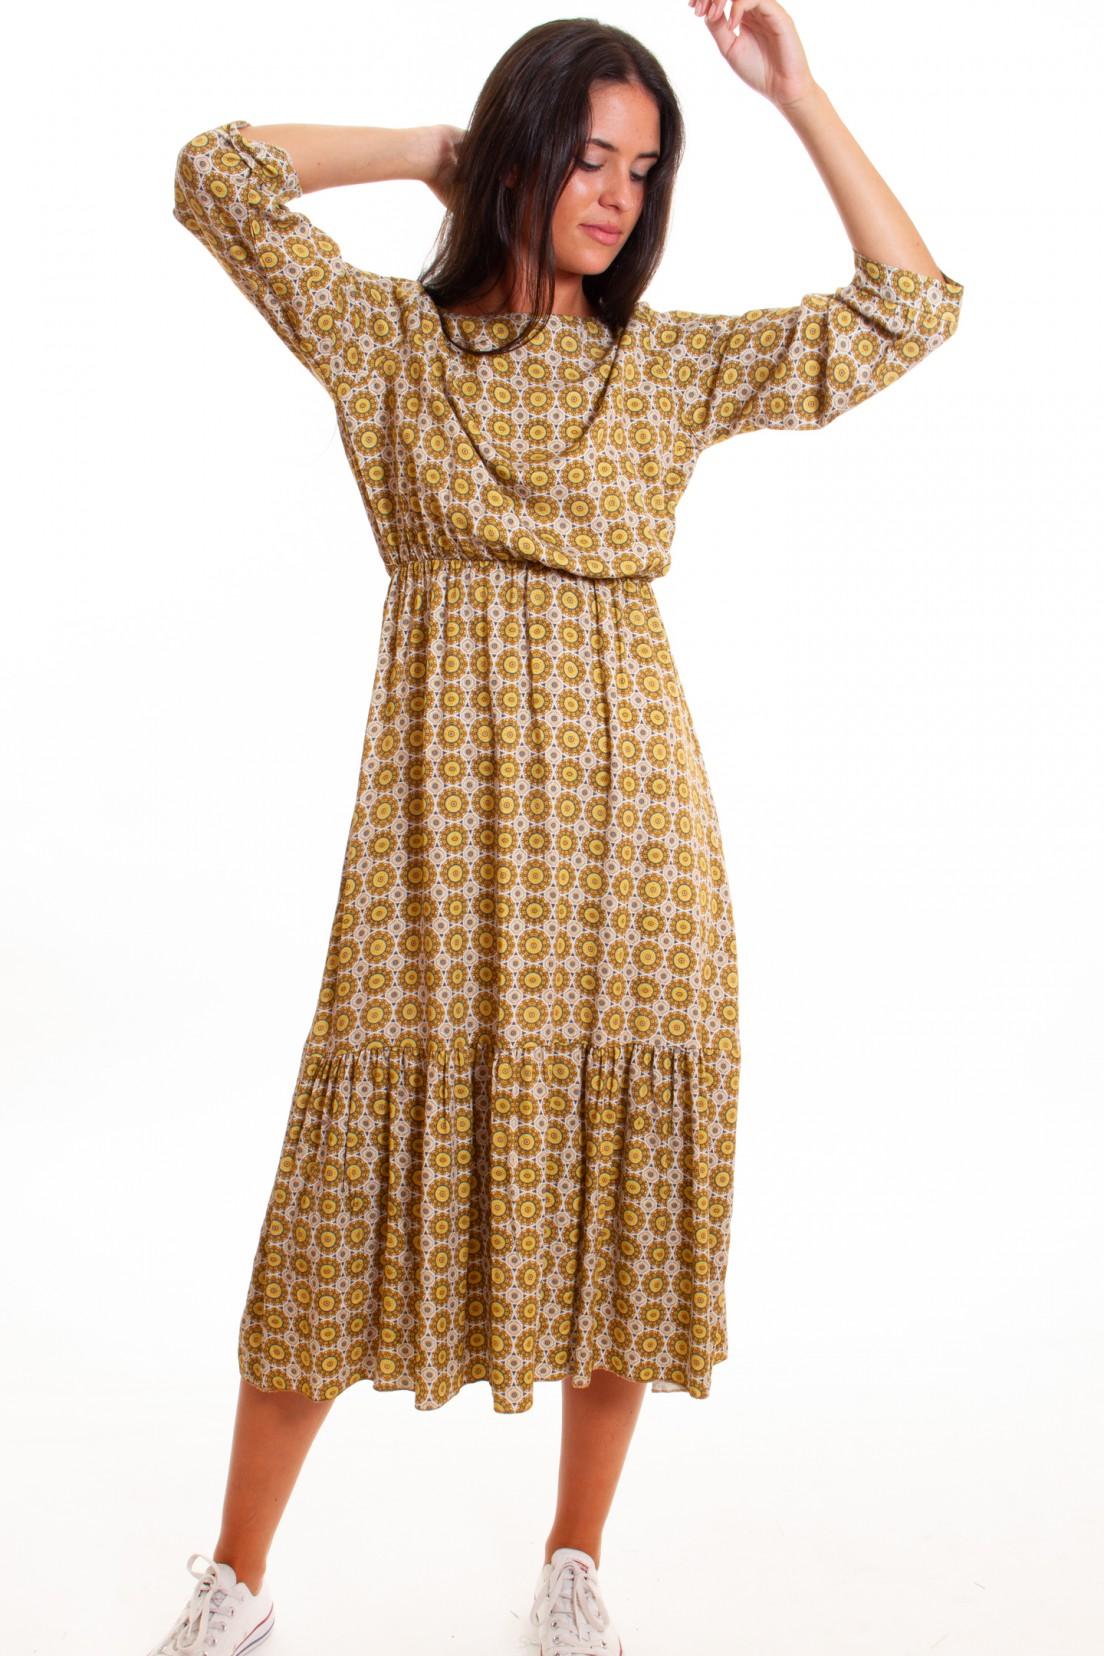 Amor por los vestidos midi